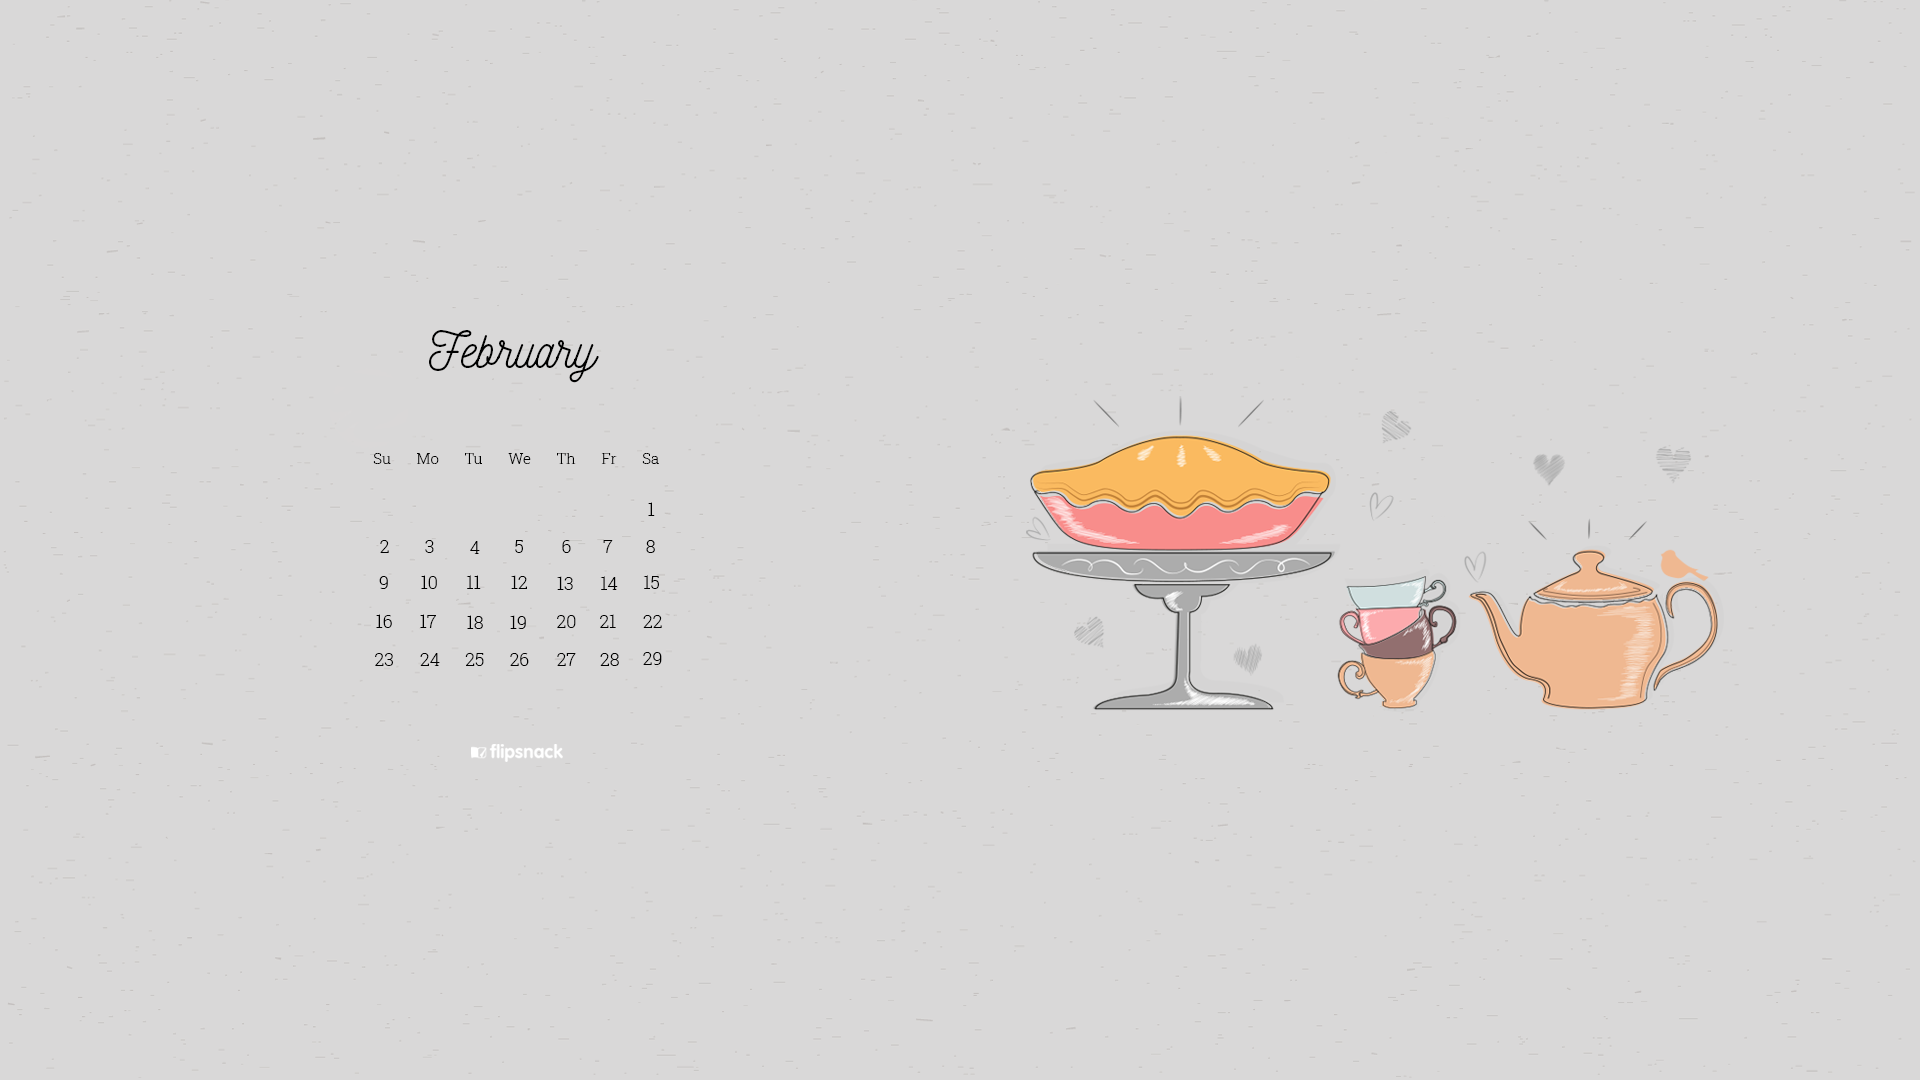 February 2020 wallpaper calendars